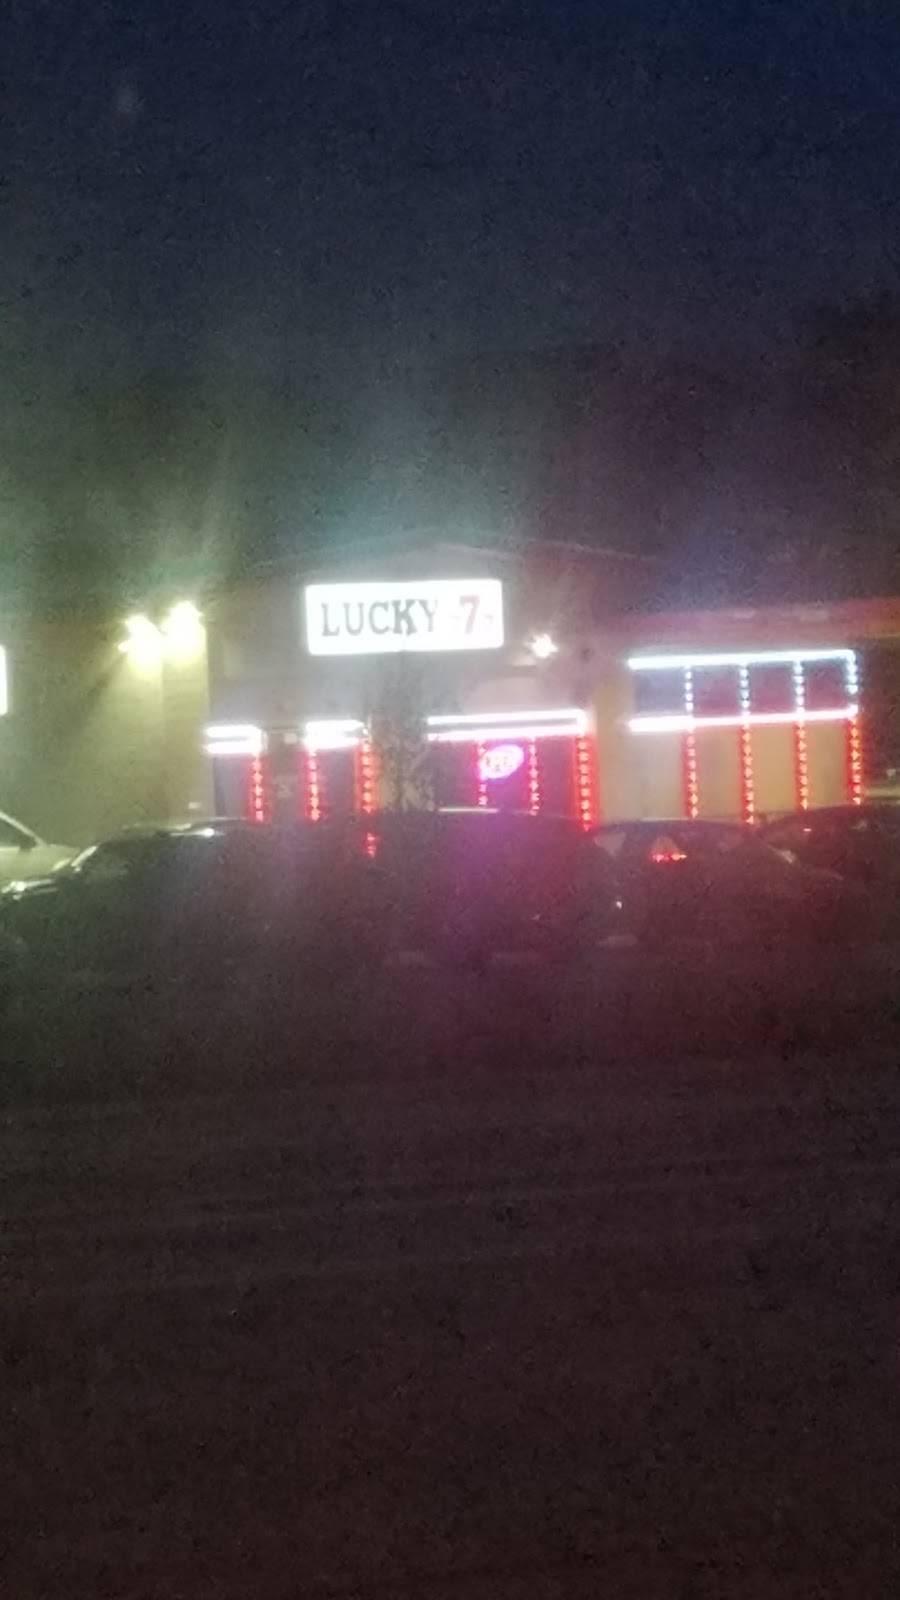 Sunoco Gas Station - gas station  | Photo 1 of 2 | Address: 1708 E Manhattan Blvd, Toledo, OH 43608, USA | Phone: (419) 787-7693